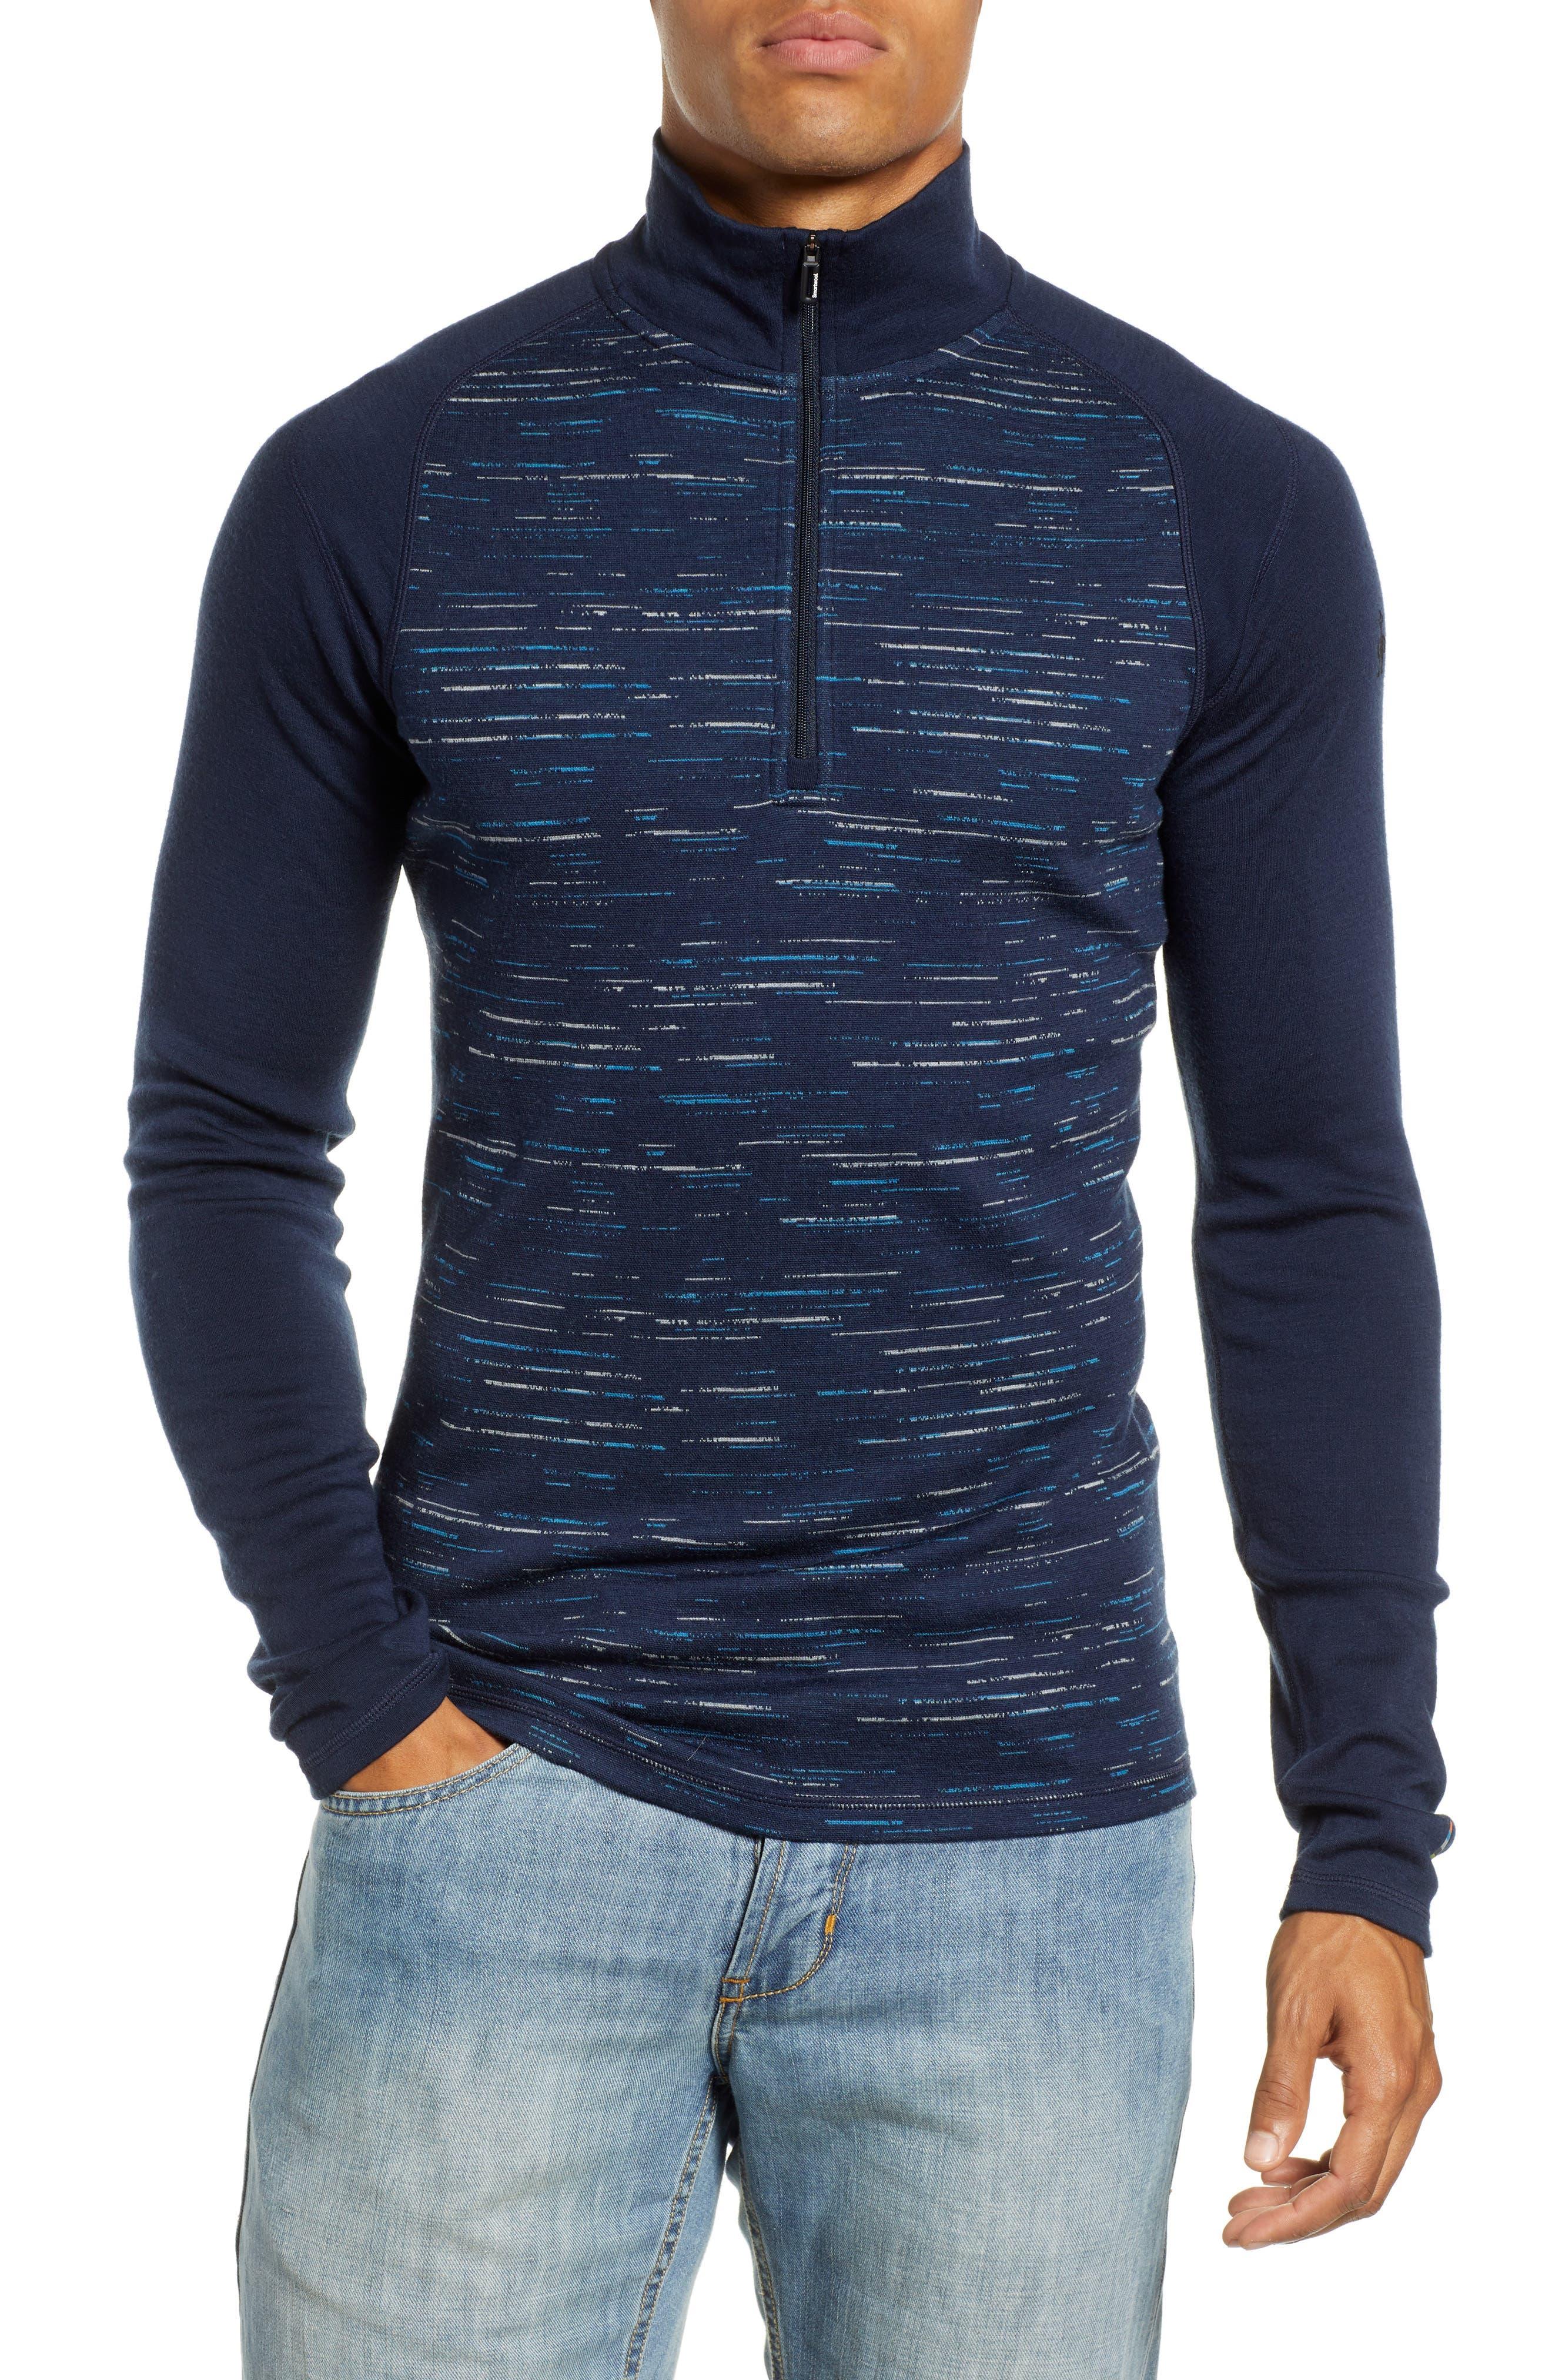 Smartwool Merino 250 Base Layer Pattern Quarter Zip Pullover, Blue